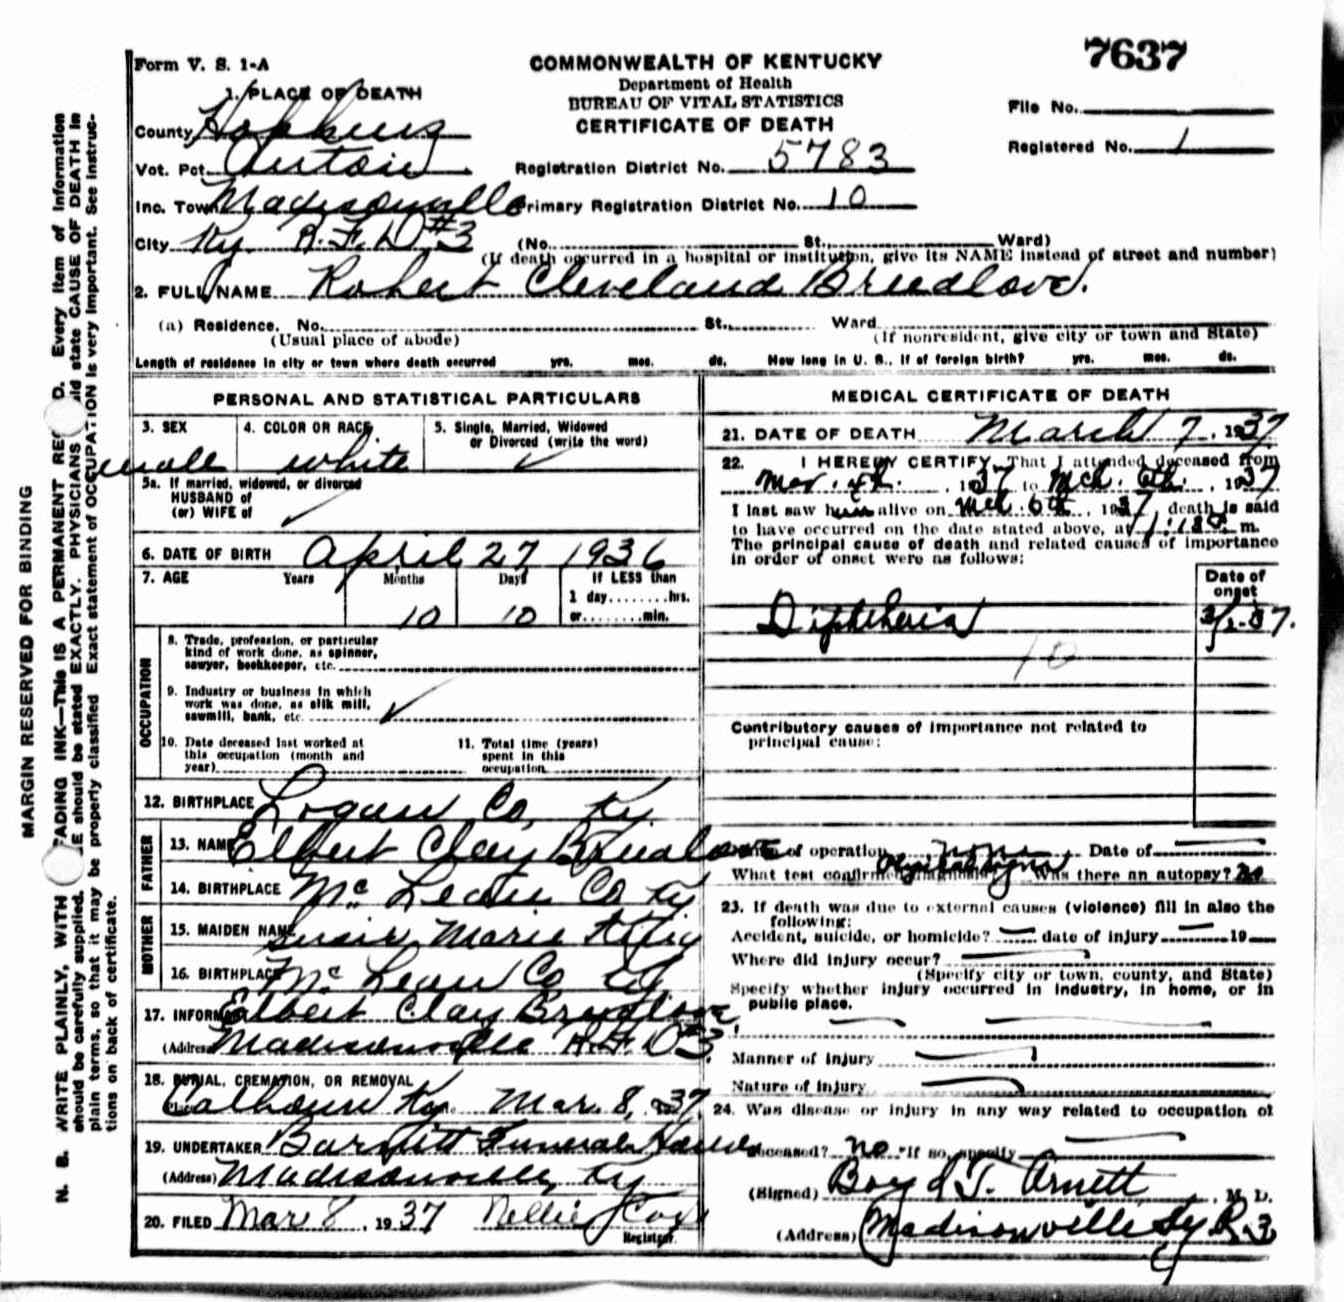 Robert Cleveland Breedlove Death